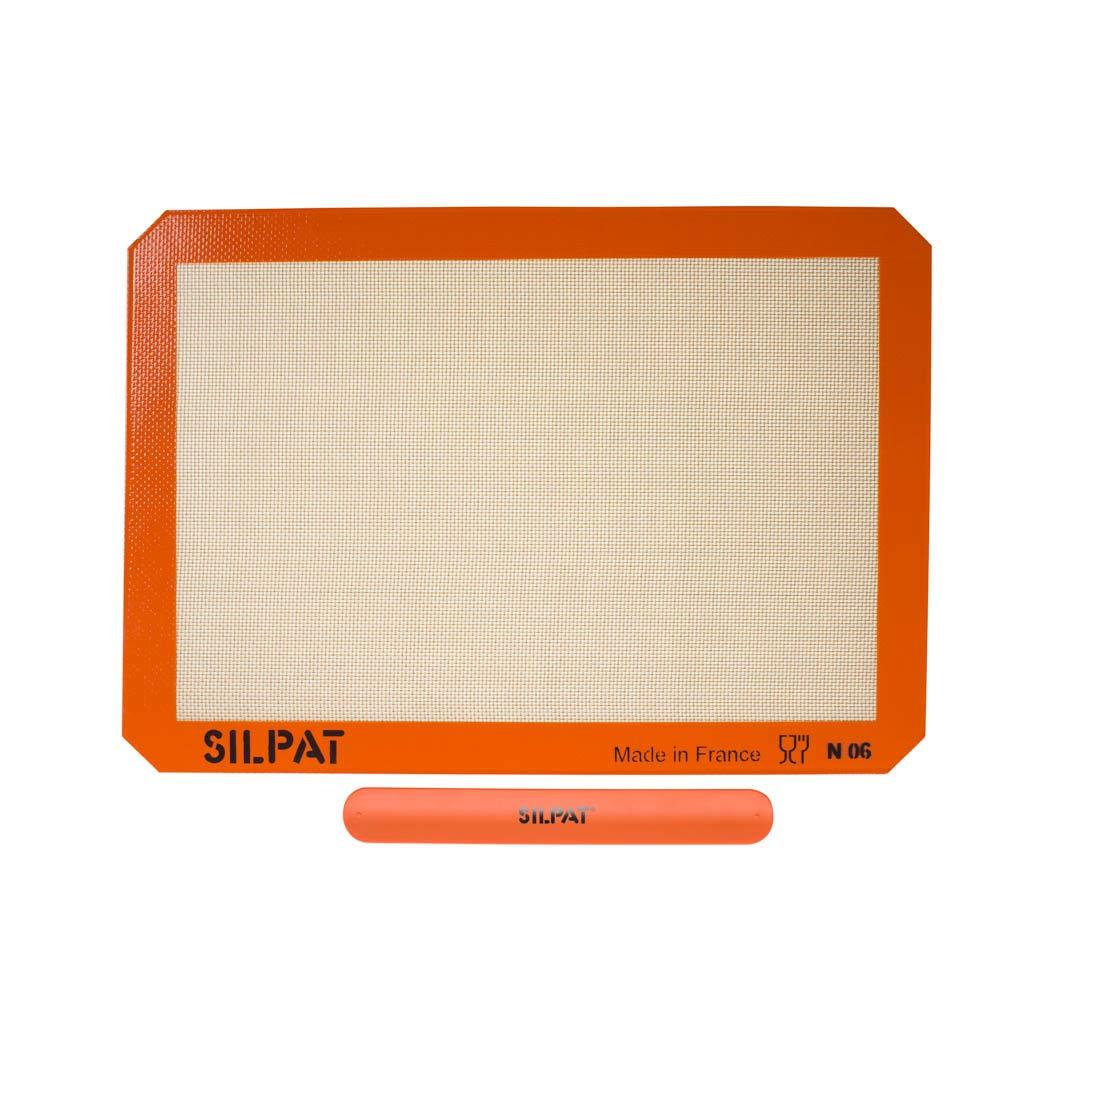 "Silpat AE420295-40 Premium Non-Stick Silicone Baking Mat with Storage Band, Half Sheet Size, 11-5/8"" x 16-1/2"""